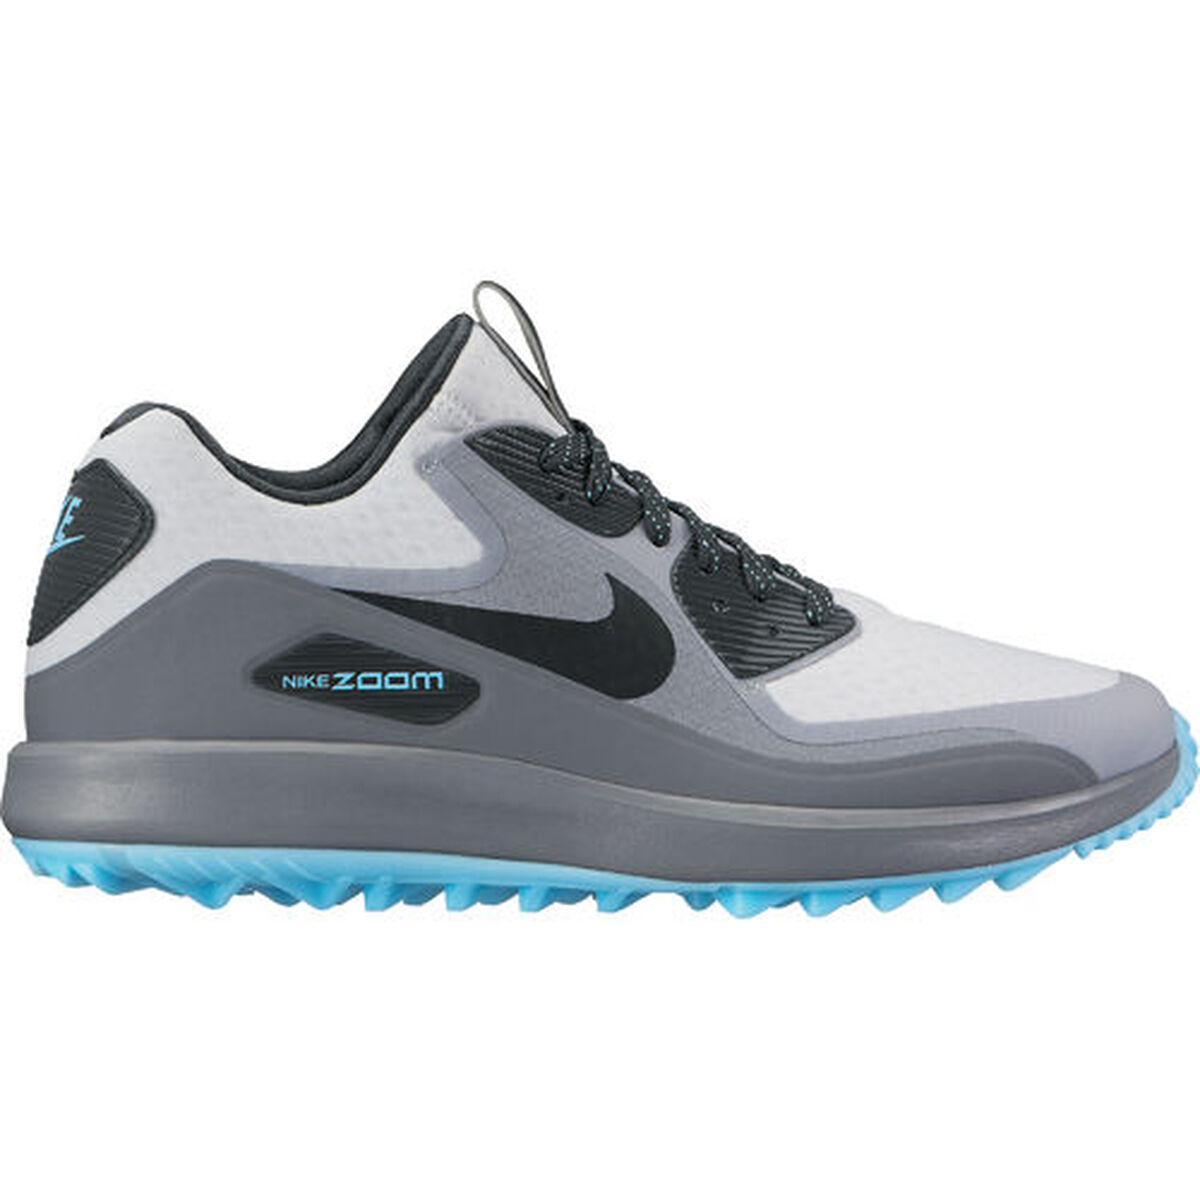 best authentic 0173b cee32 Nike Air Zoom 90 IT Men s Golf Shoe - Grey Silver